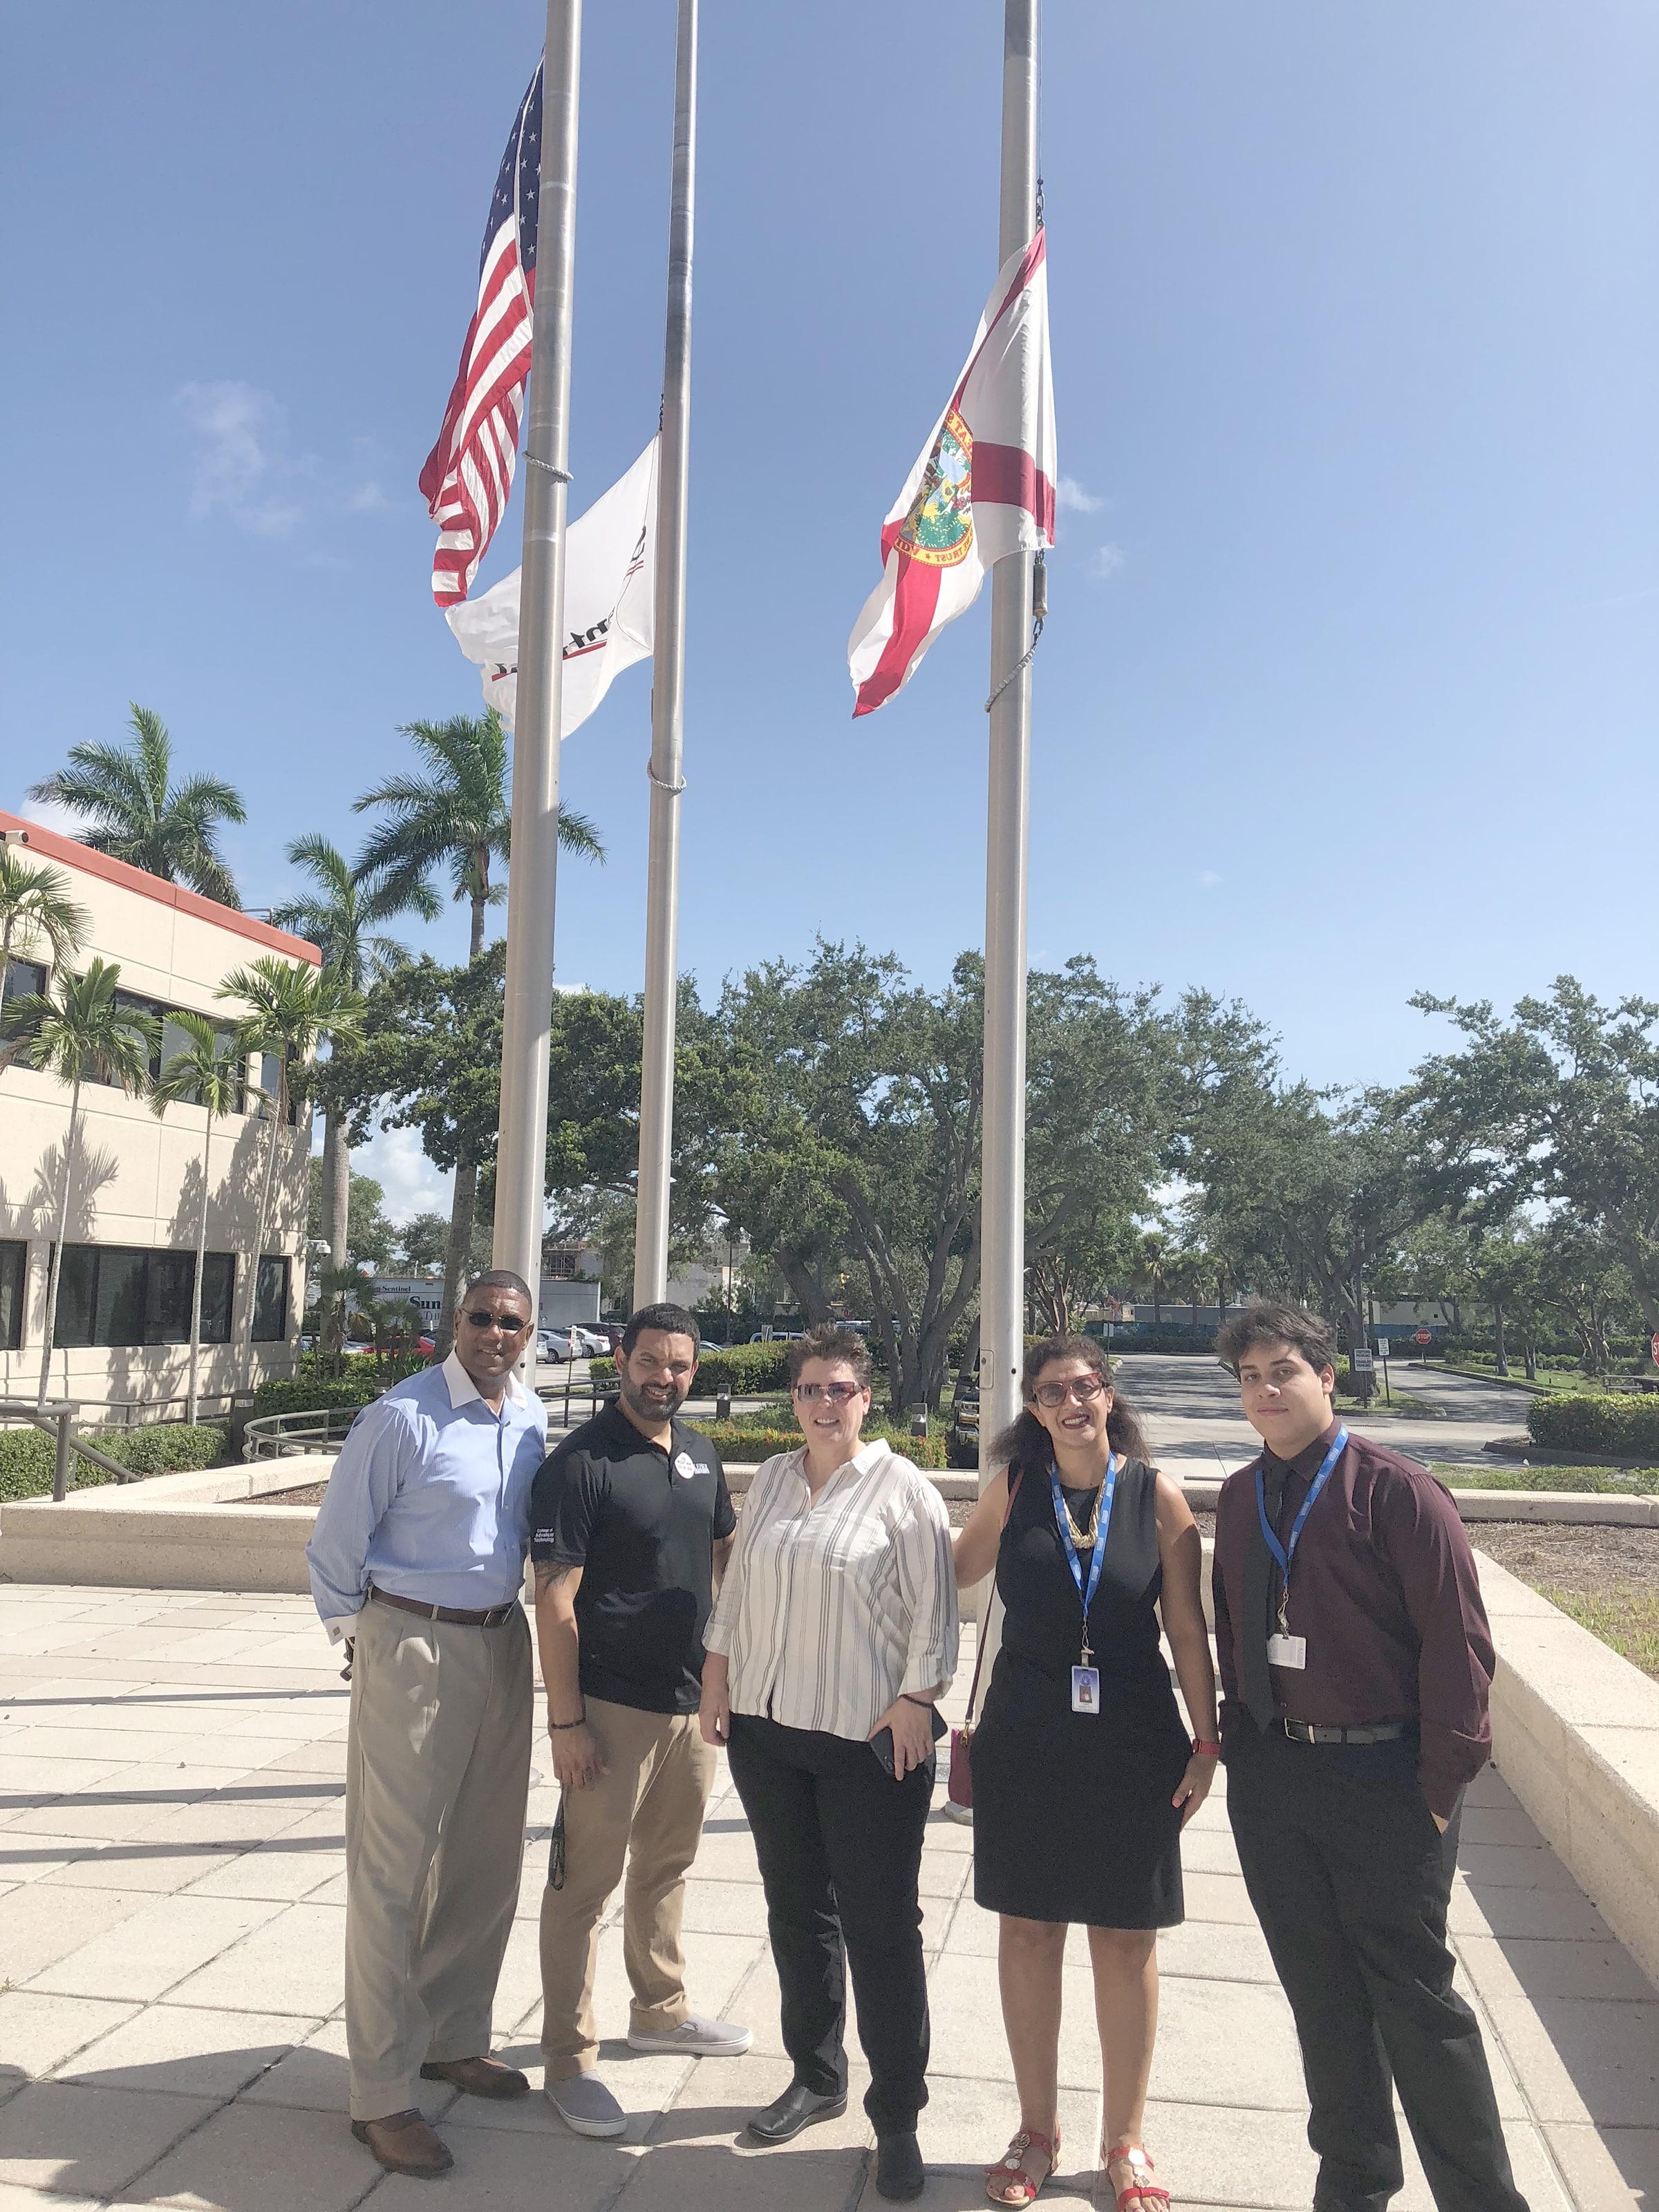 KU Pembroke Pines Campus Students Enjoy Tour of the Sun-Sentinel